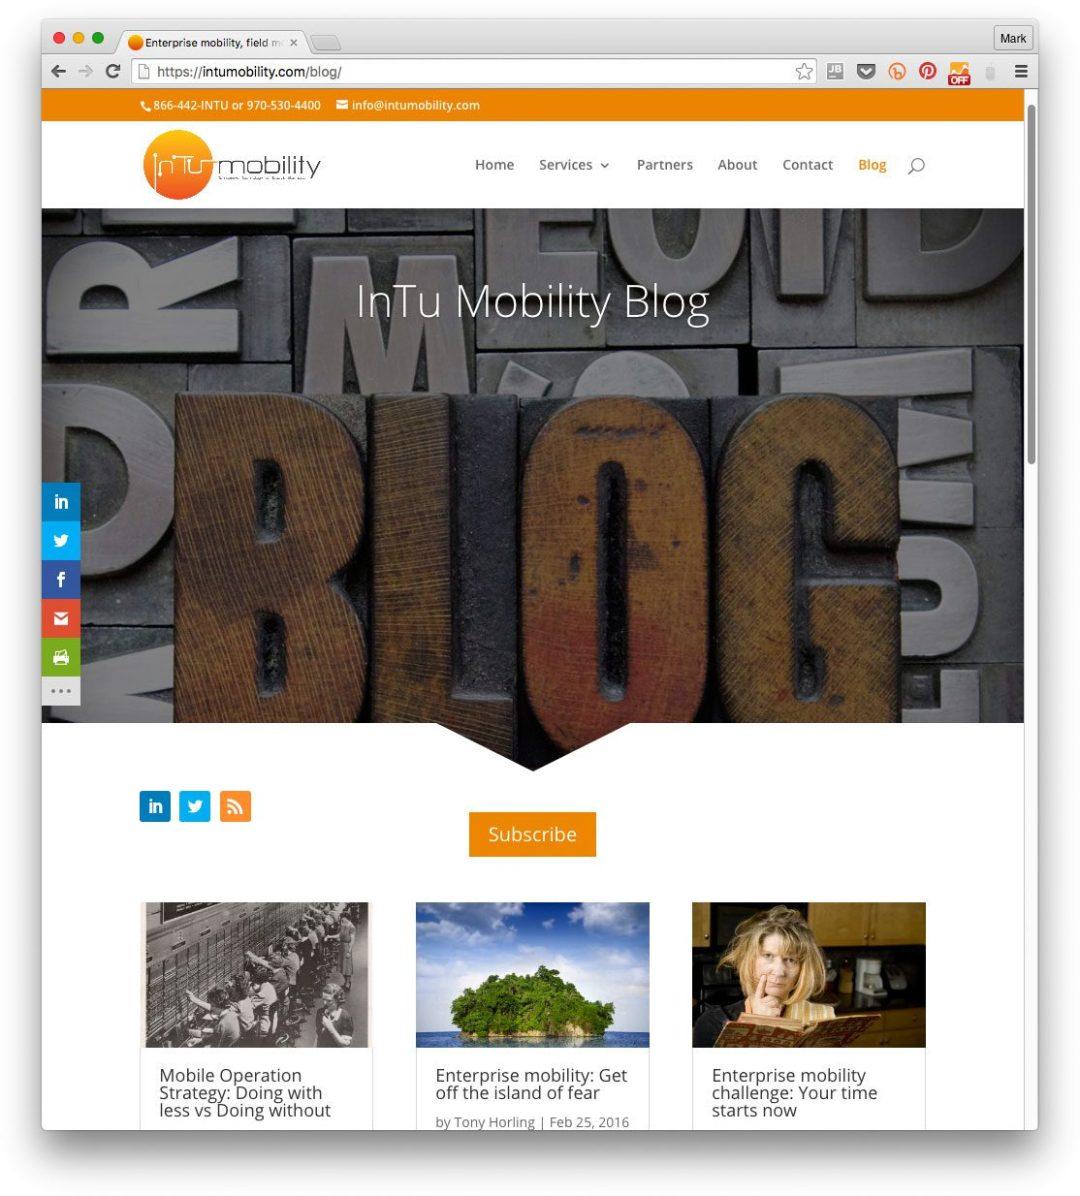 Enterprise mobility blog for InTu Mobility